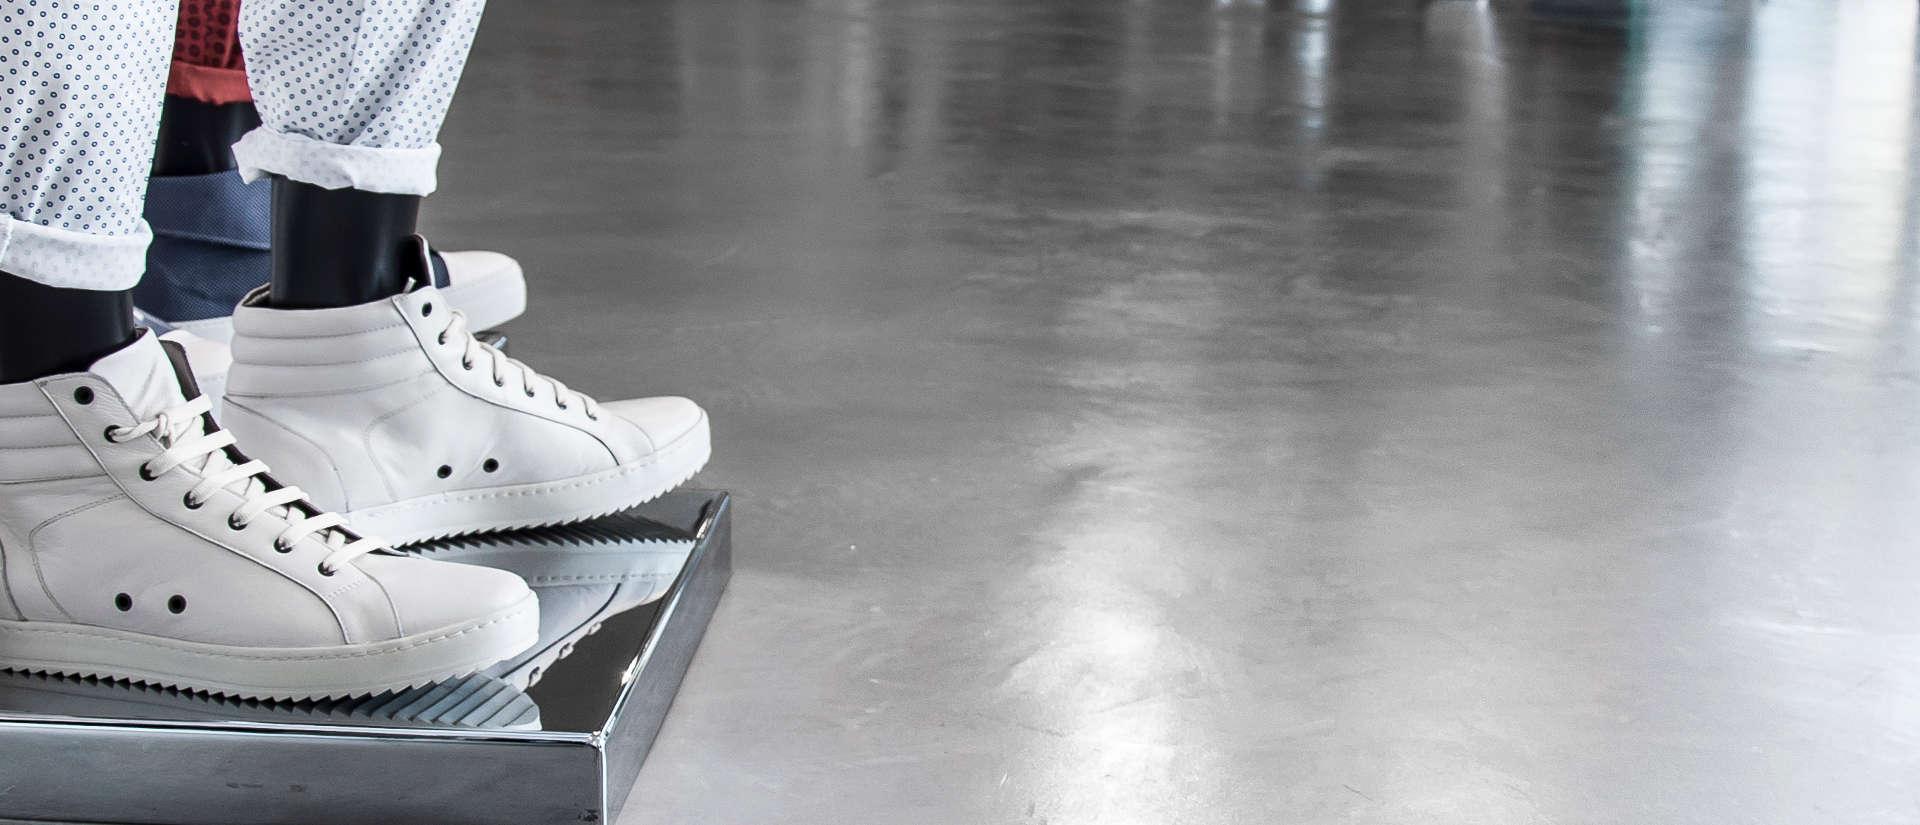 Resine Sberna: Tecnica Materica, resine per pavimenti, resine per ...